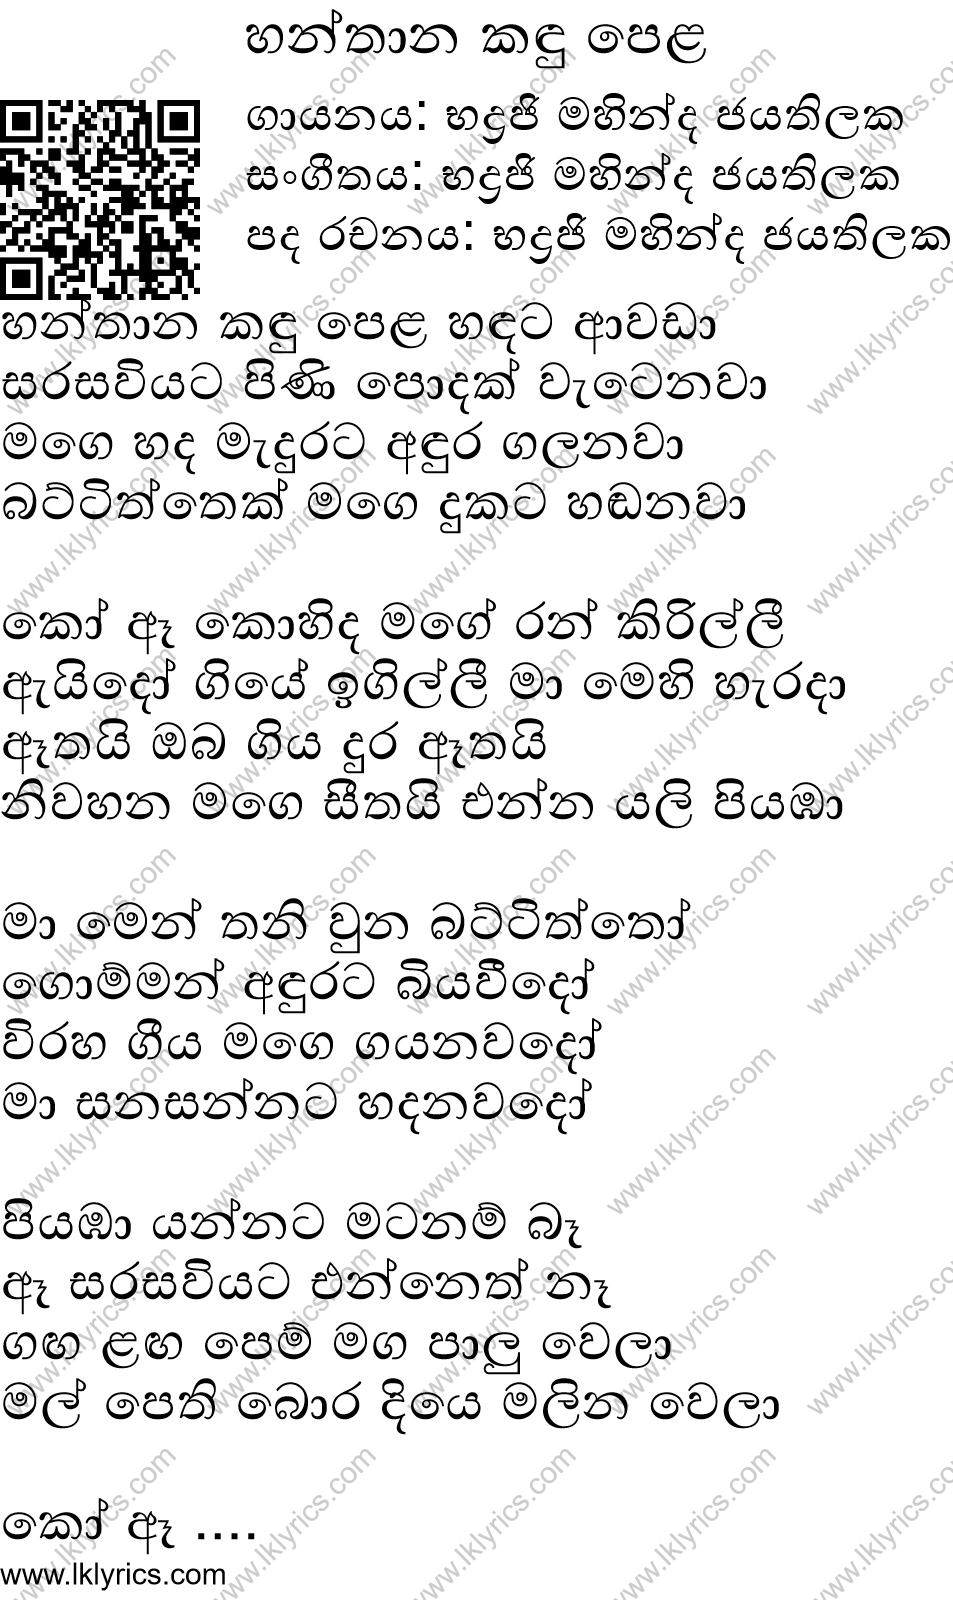 bhadraji mahinda jayathilaka mp3